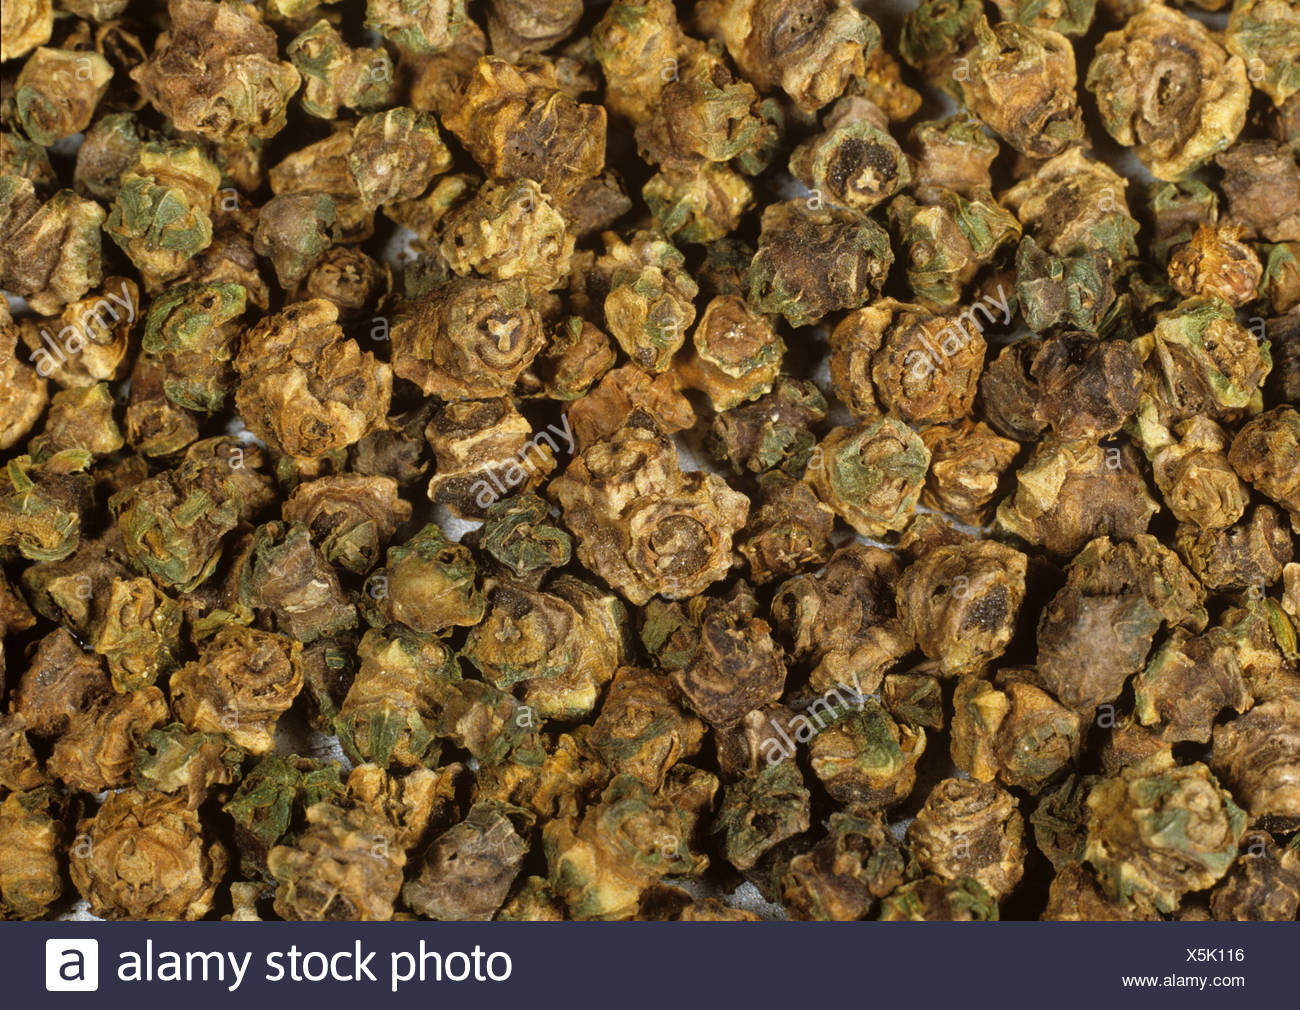 Sugar beet crop seed - Stock Image